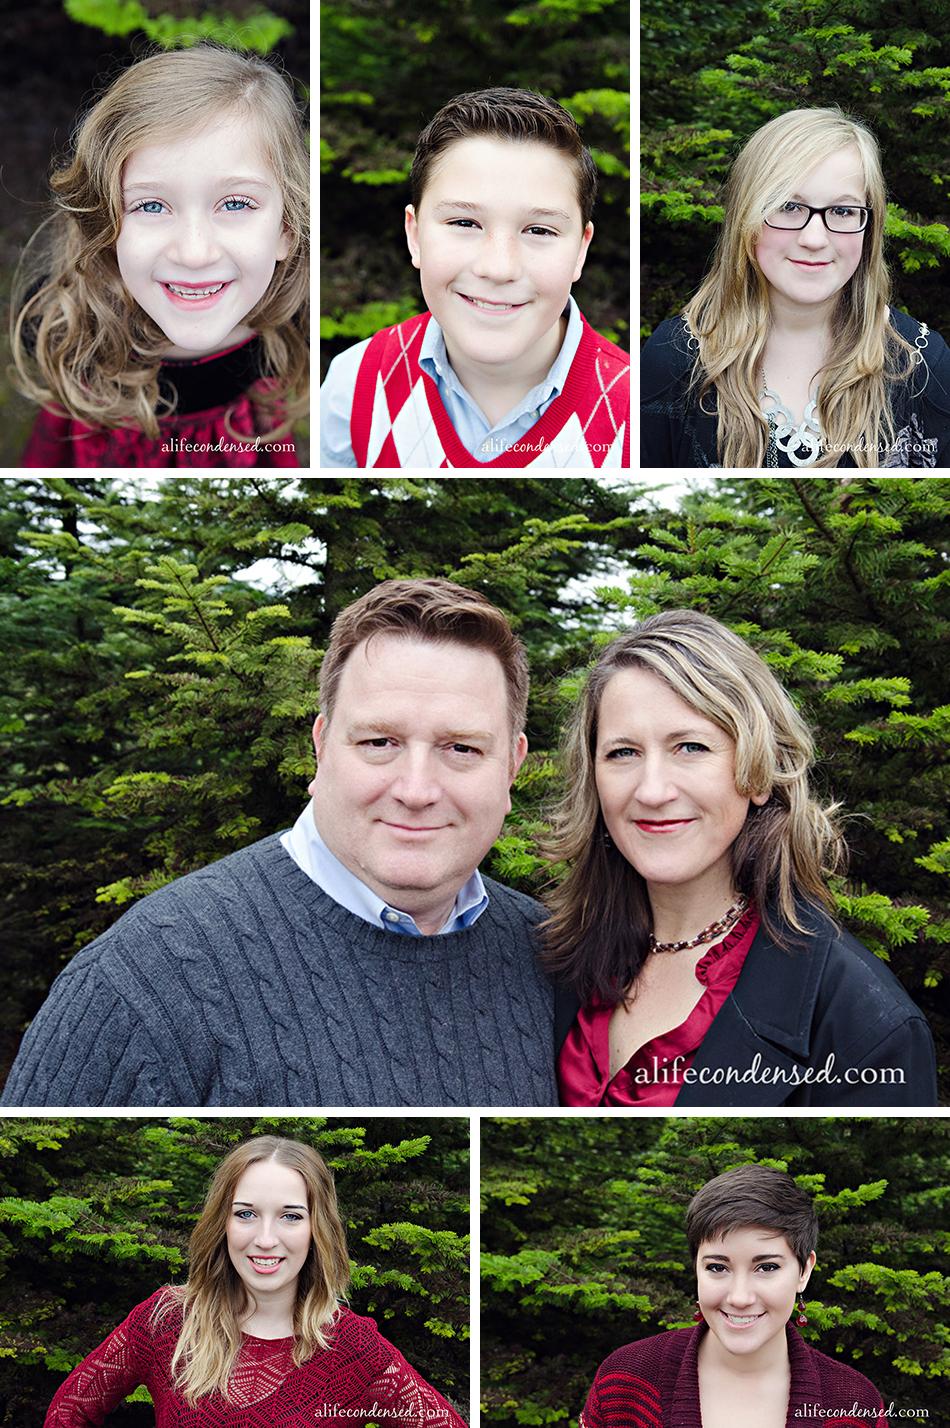 S Family :: A Life Condensed Photography :: Hillsboro, Oregon Family Photographer